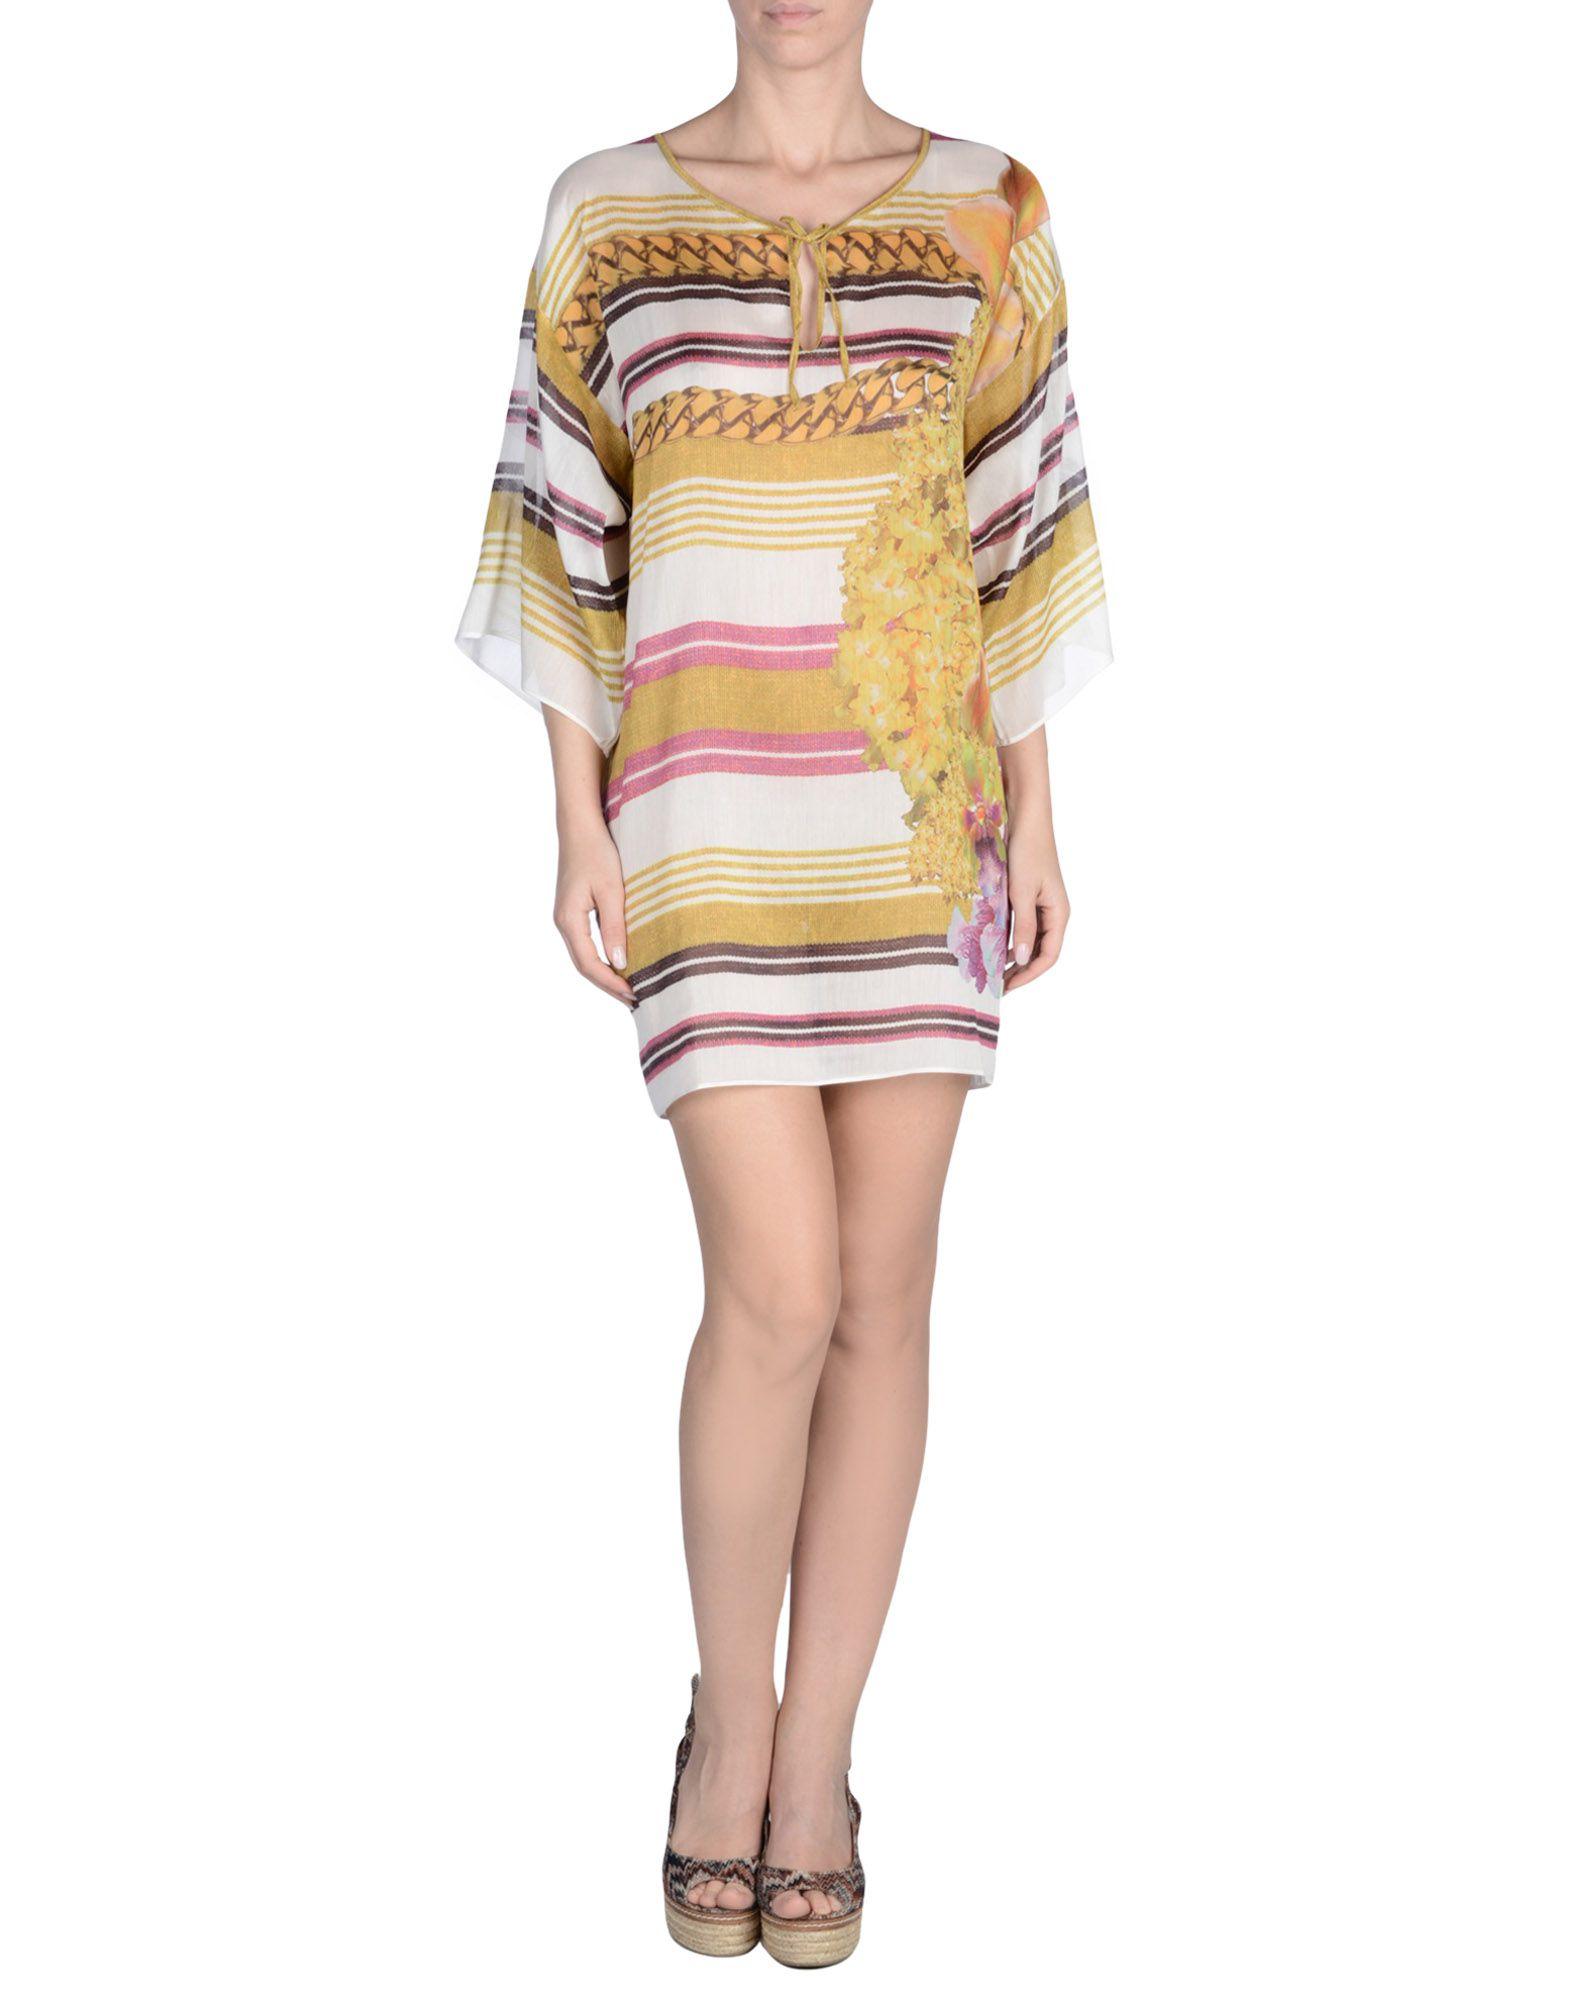 ROBERTO CAVALLI BEACHWEAR Пляжное платье roberto verino vv tropic